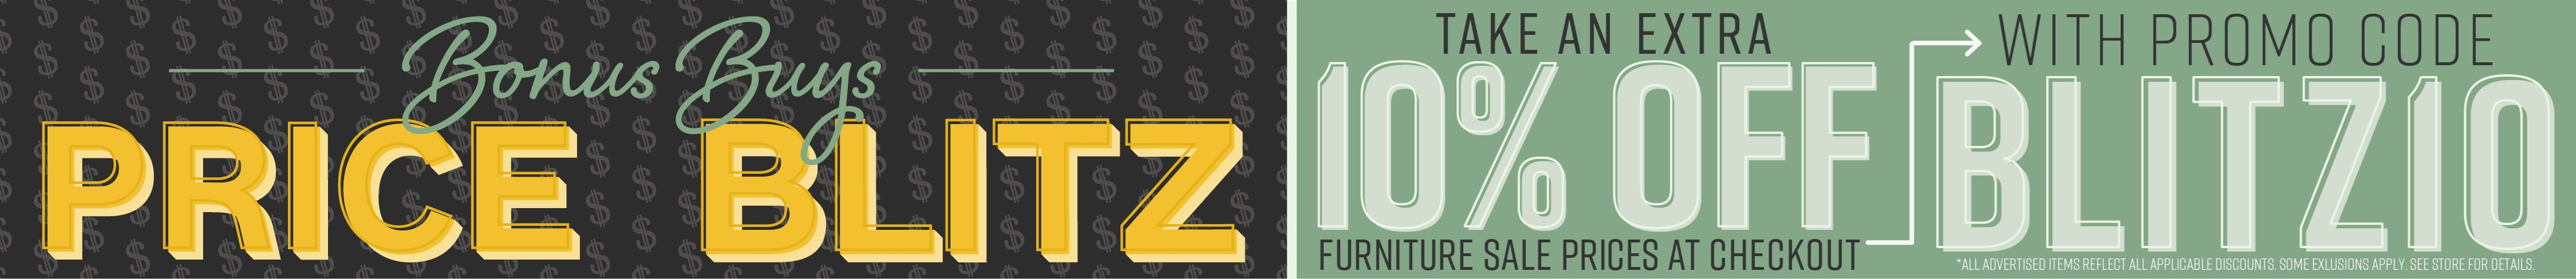 Furniture & ApplianceMart Bonus Buys Price Blitz